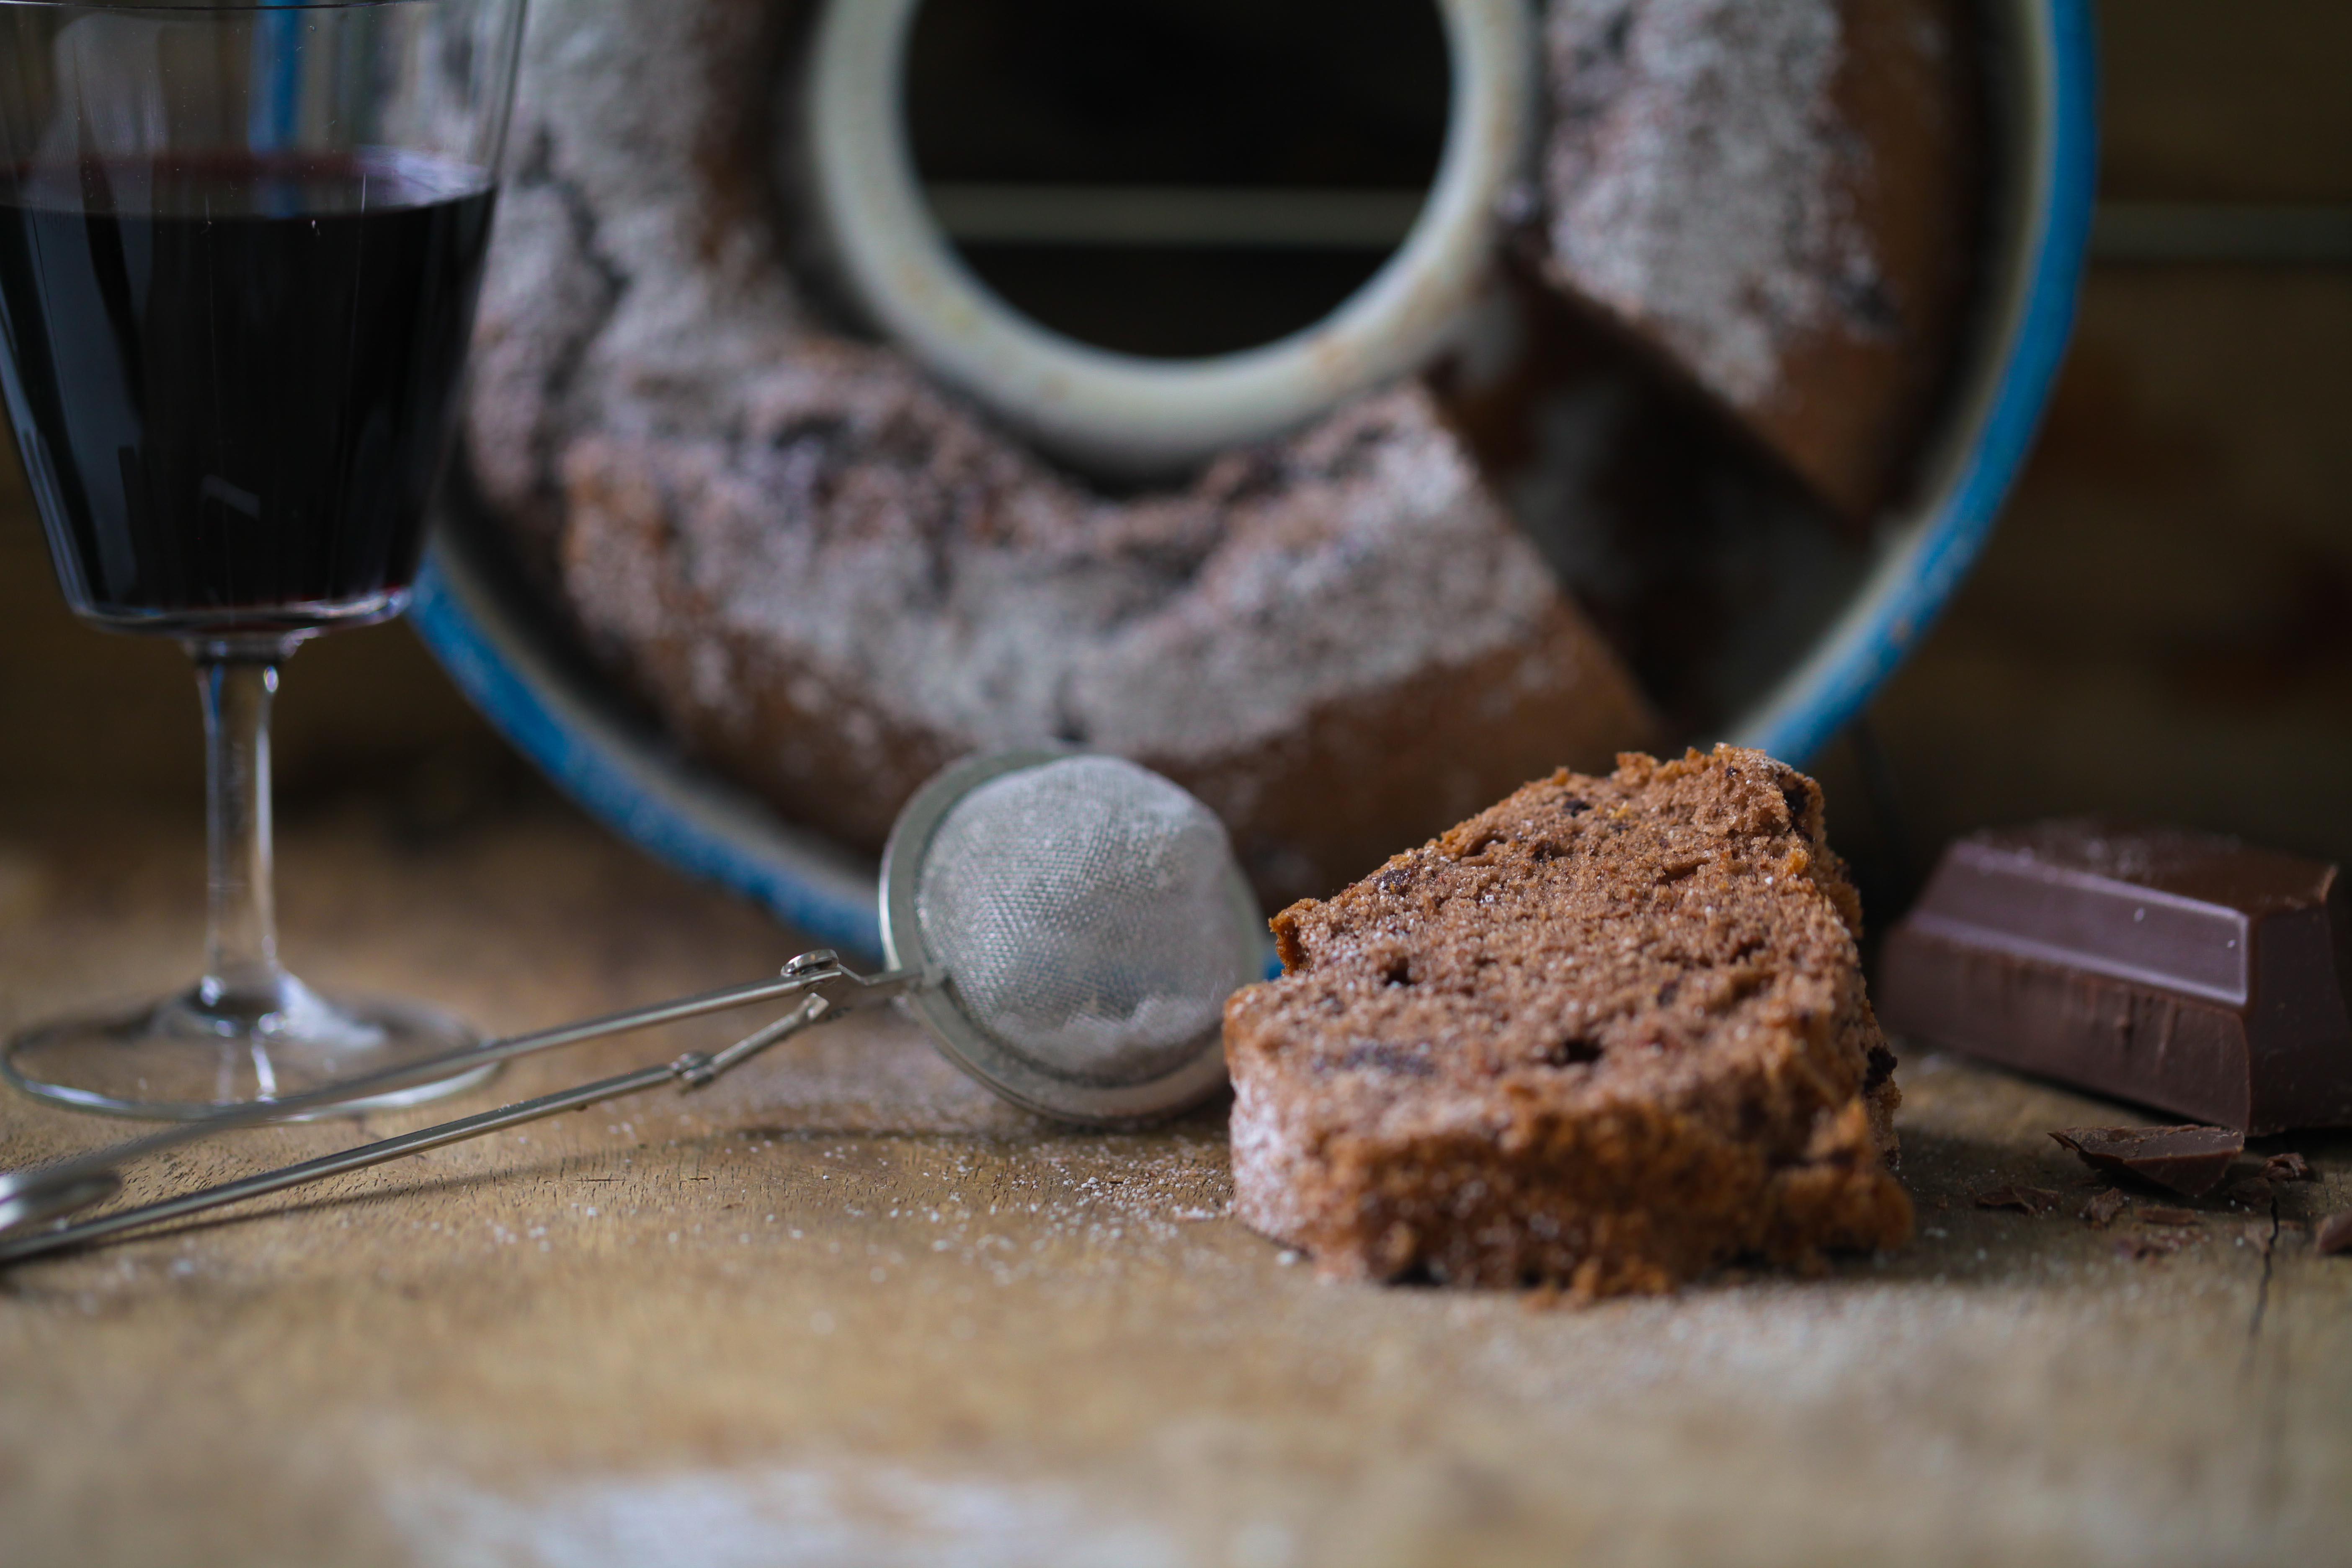 Zuckerzimtundliebe Rezept Backrezept Rotweinkuchen Schokoladenkuchen Napfkuchen Rührteig_-7